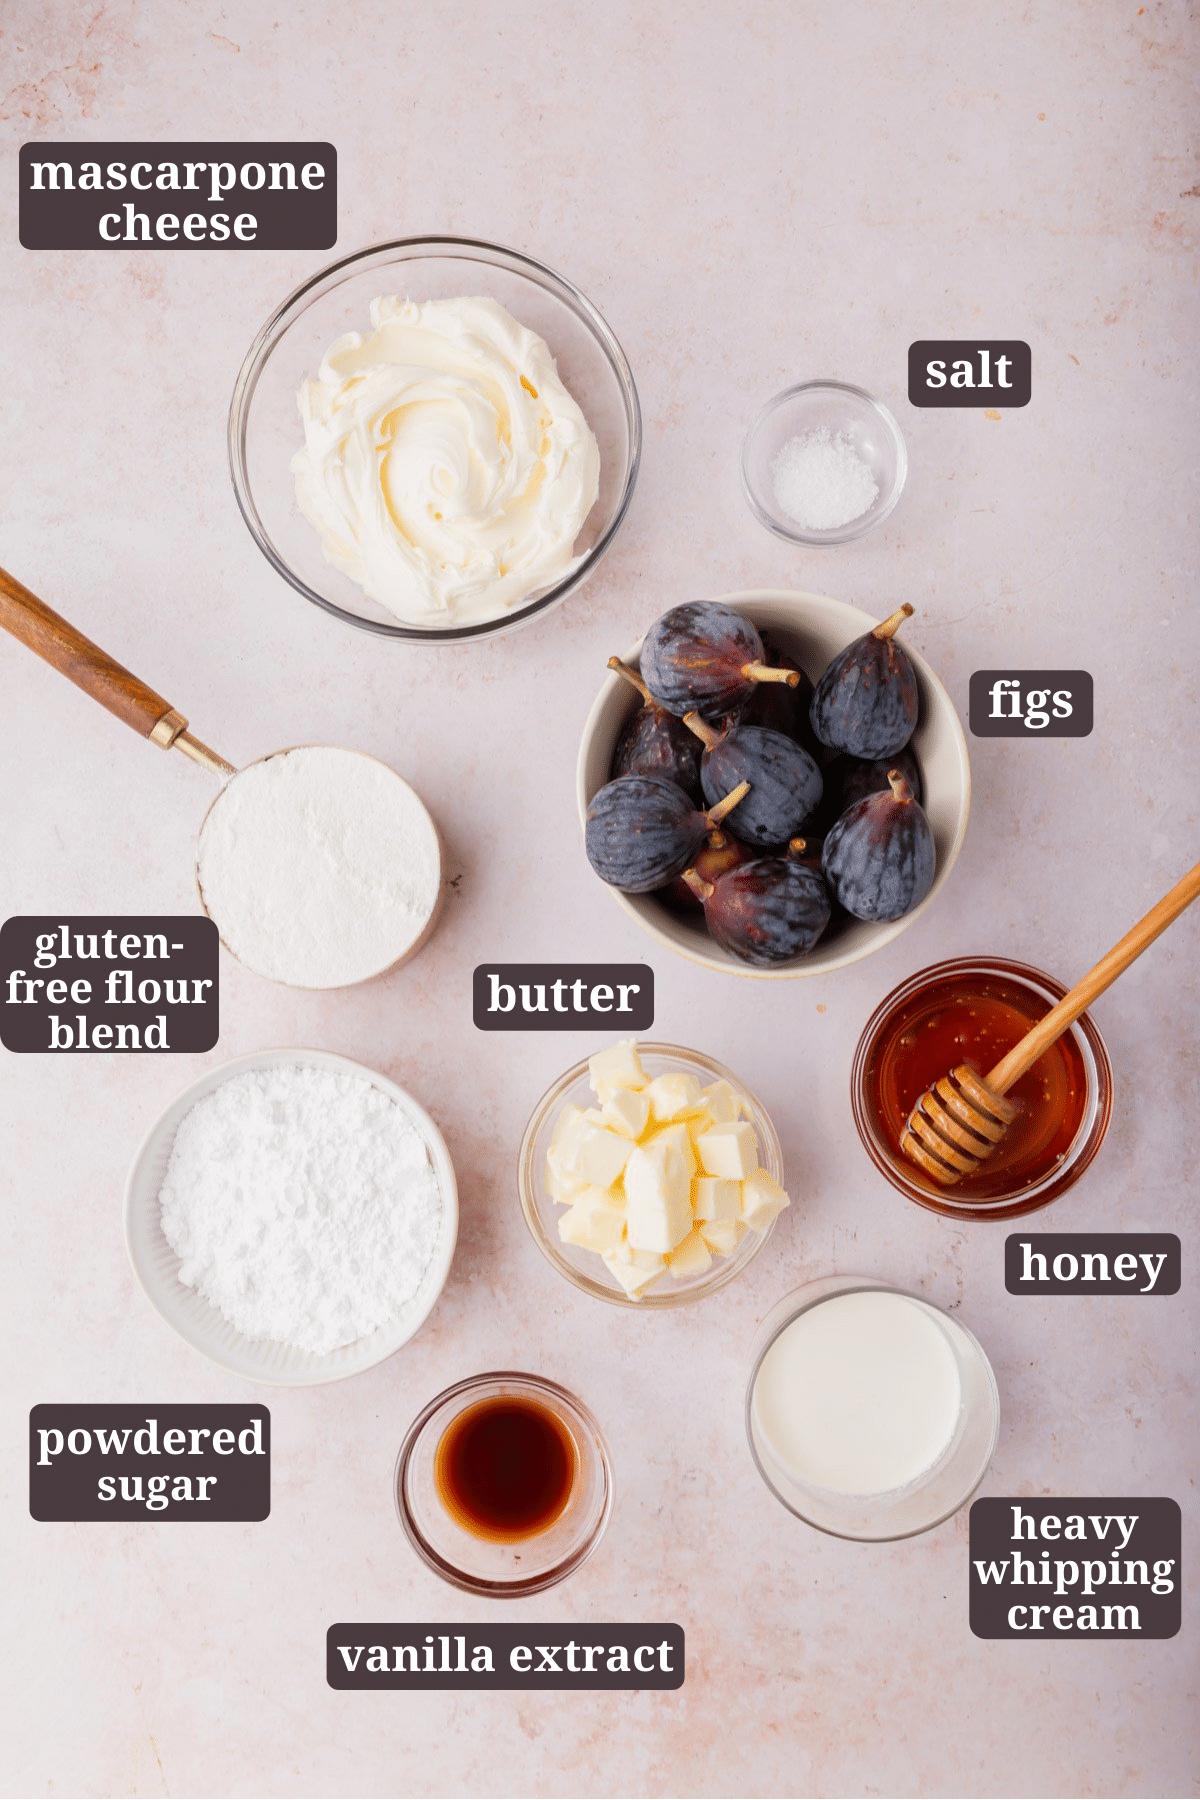 Ingredients for making gluten-free fig tart.